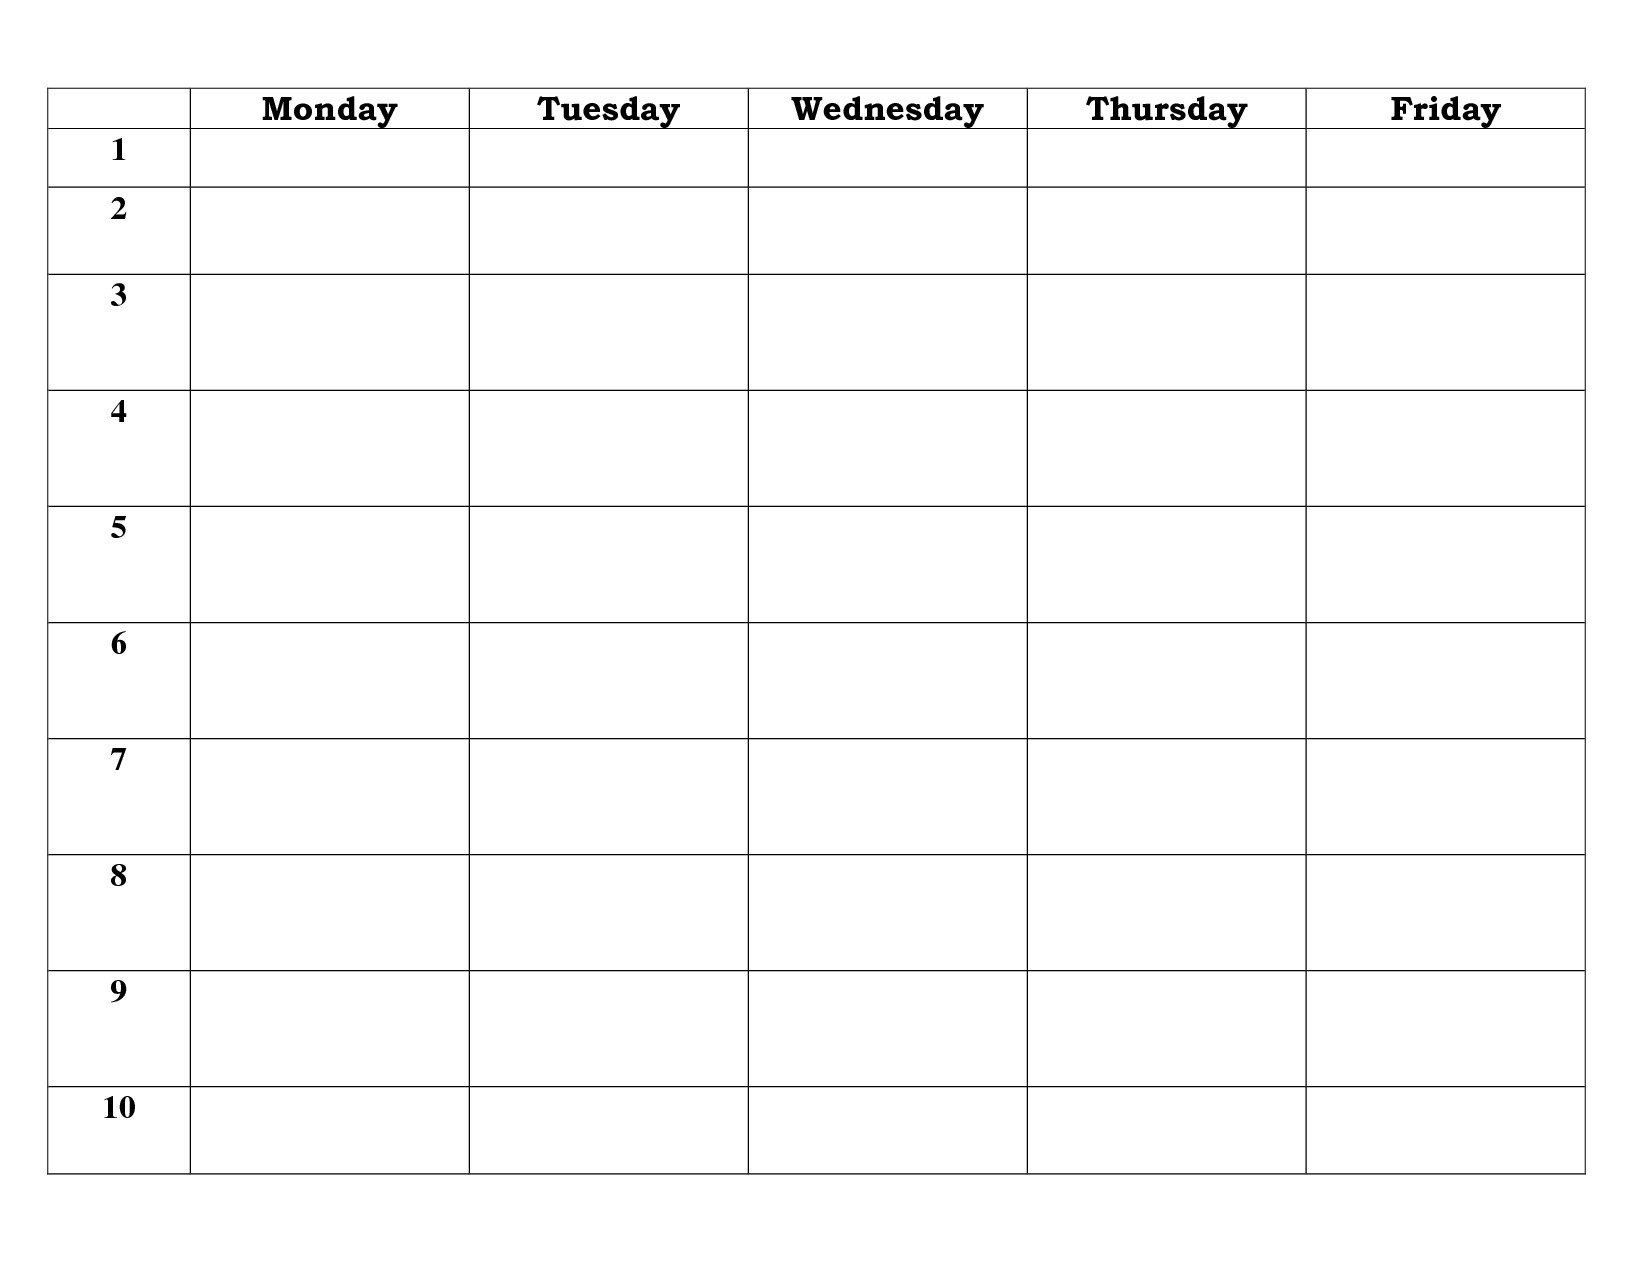 Blank Calendar Template 5 Day - Calendar Inspiration Design with regard to Create Your Own Calendar For Free